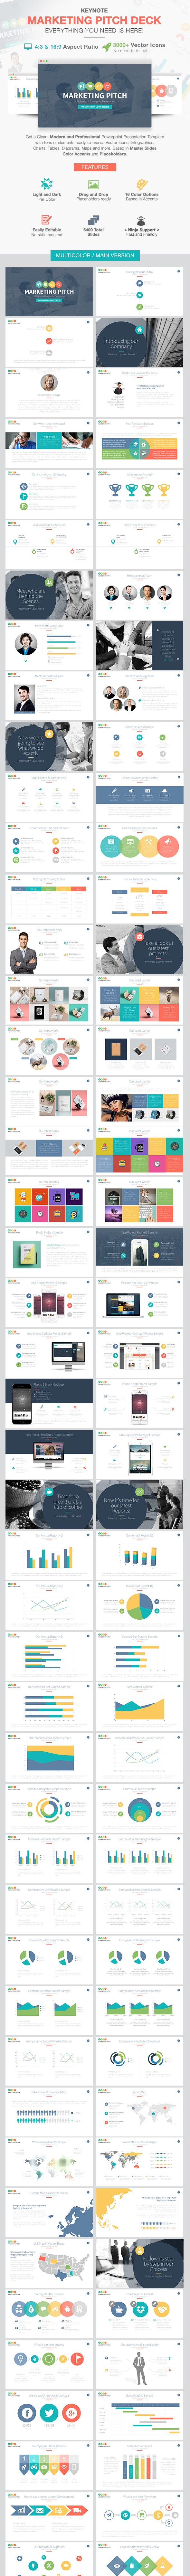 Marketing Slide Pitch Deck Keynote Template - Keynote Templates Presentation Templates